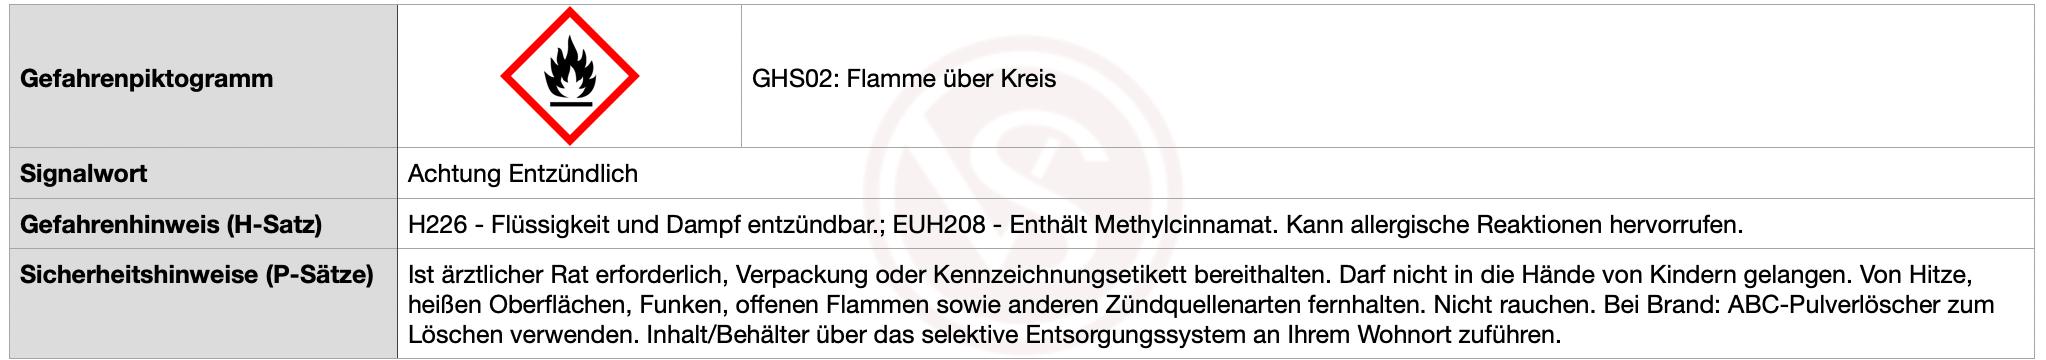 Achtung_Entzundbar_H226-und-EUH208_Methylcinnamat-min